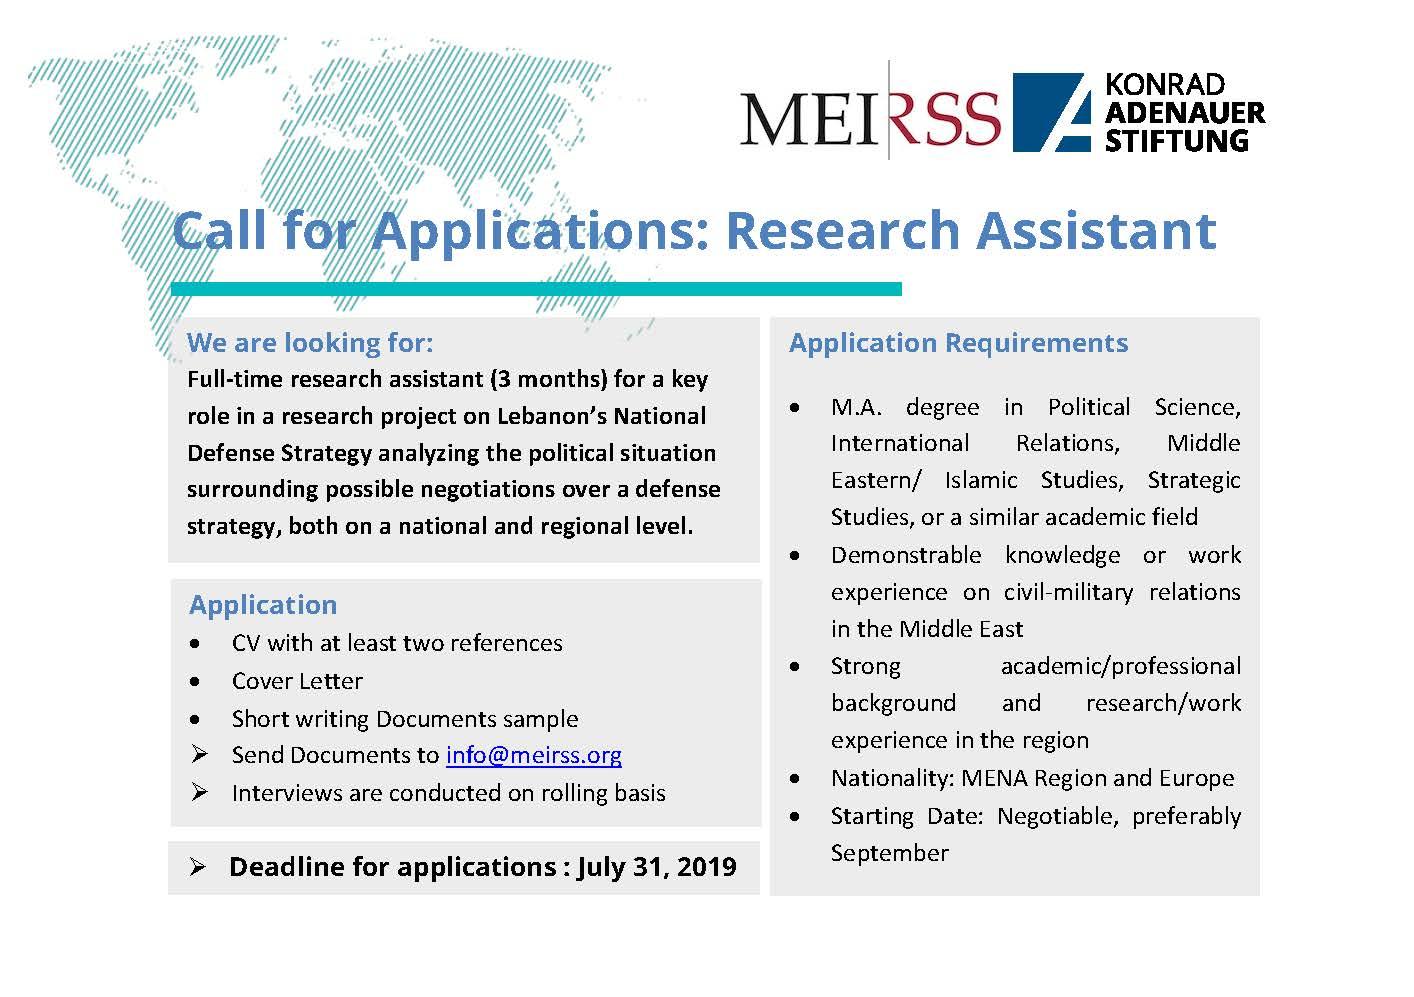 Konrad-Adenauer-Stiftung - Lebanon Office - Call for Applications